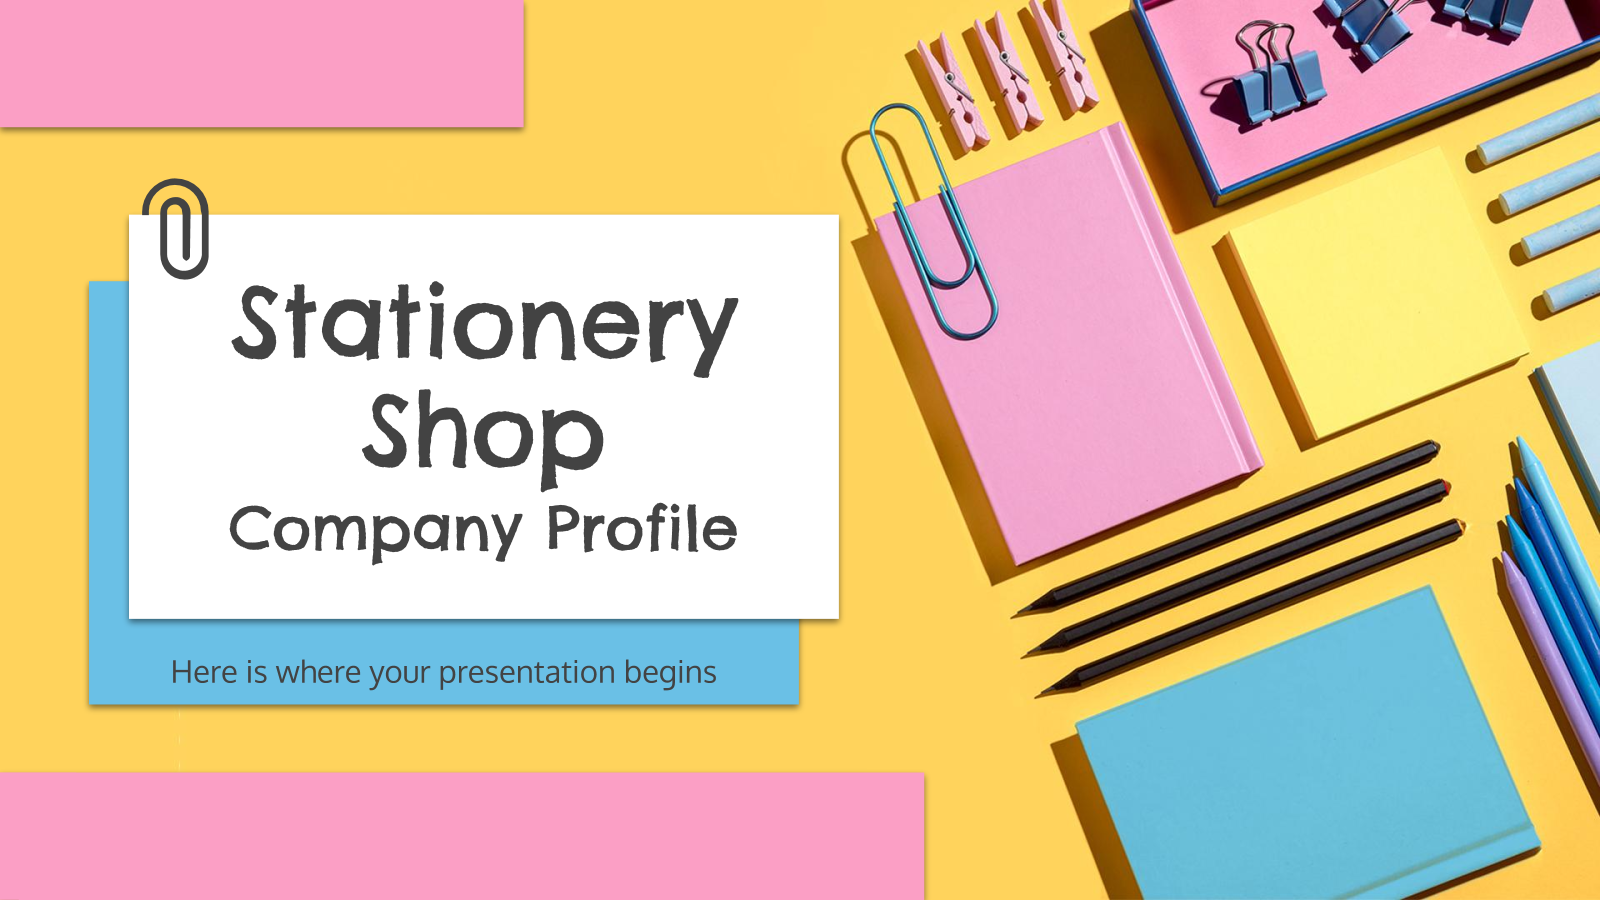 Stationery Shop Company Profile presentation template